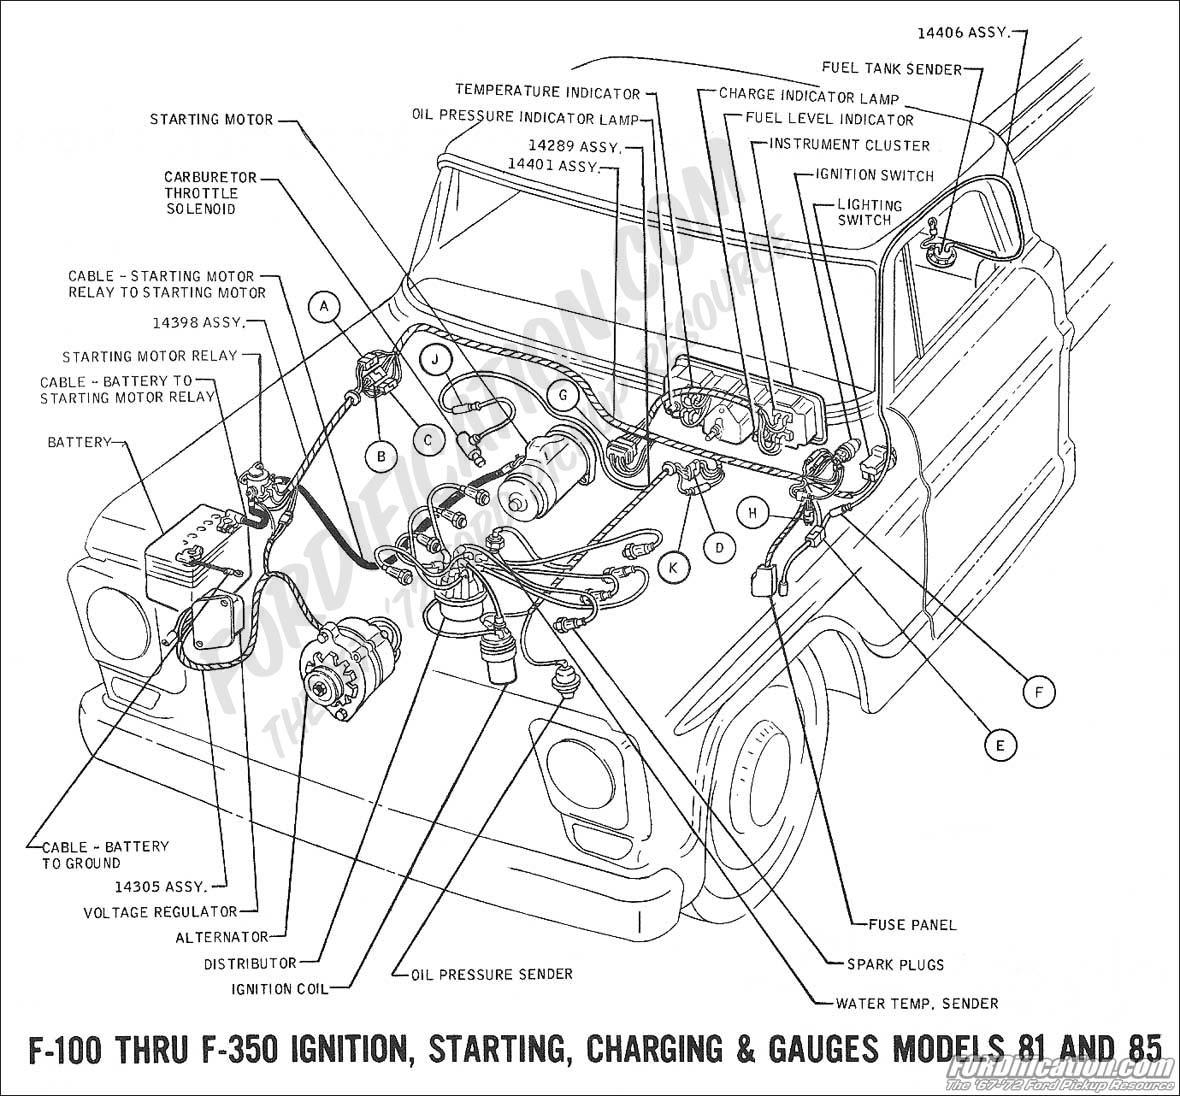 1977 Ford Pickup Wiring Diagram Diy Enthusiasts Diagrams 1962 Truck F 250 Regulator 150 Rh Banyan Palace Com Harness